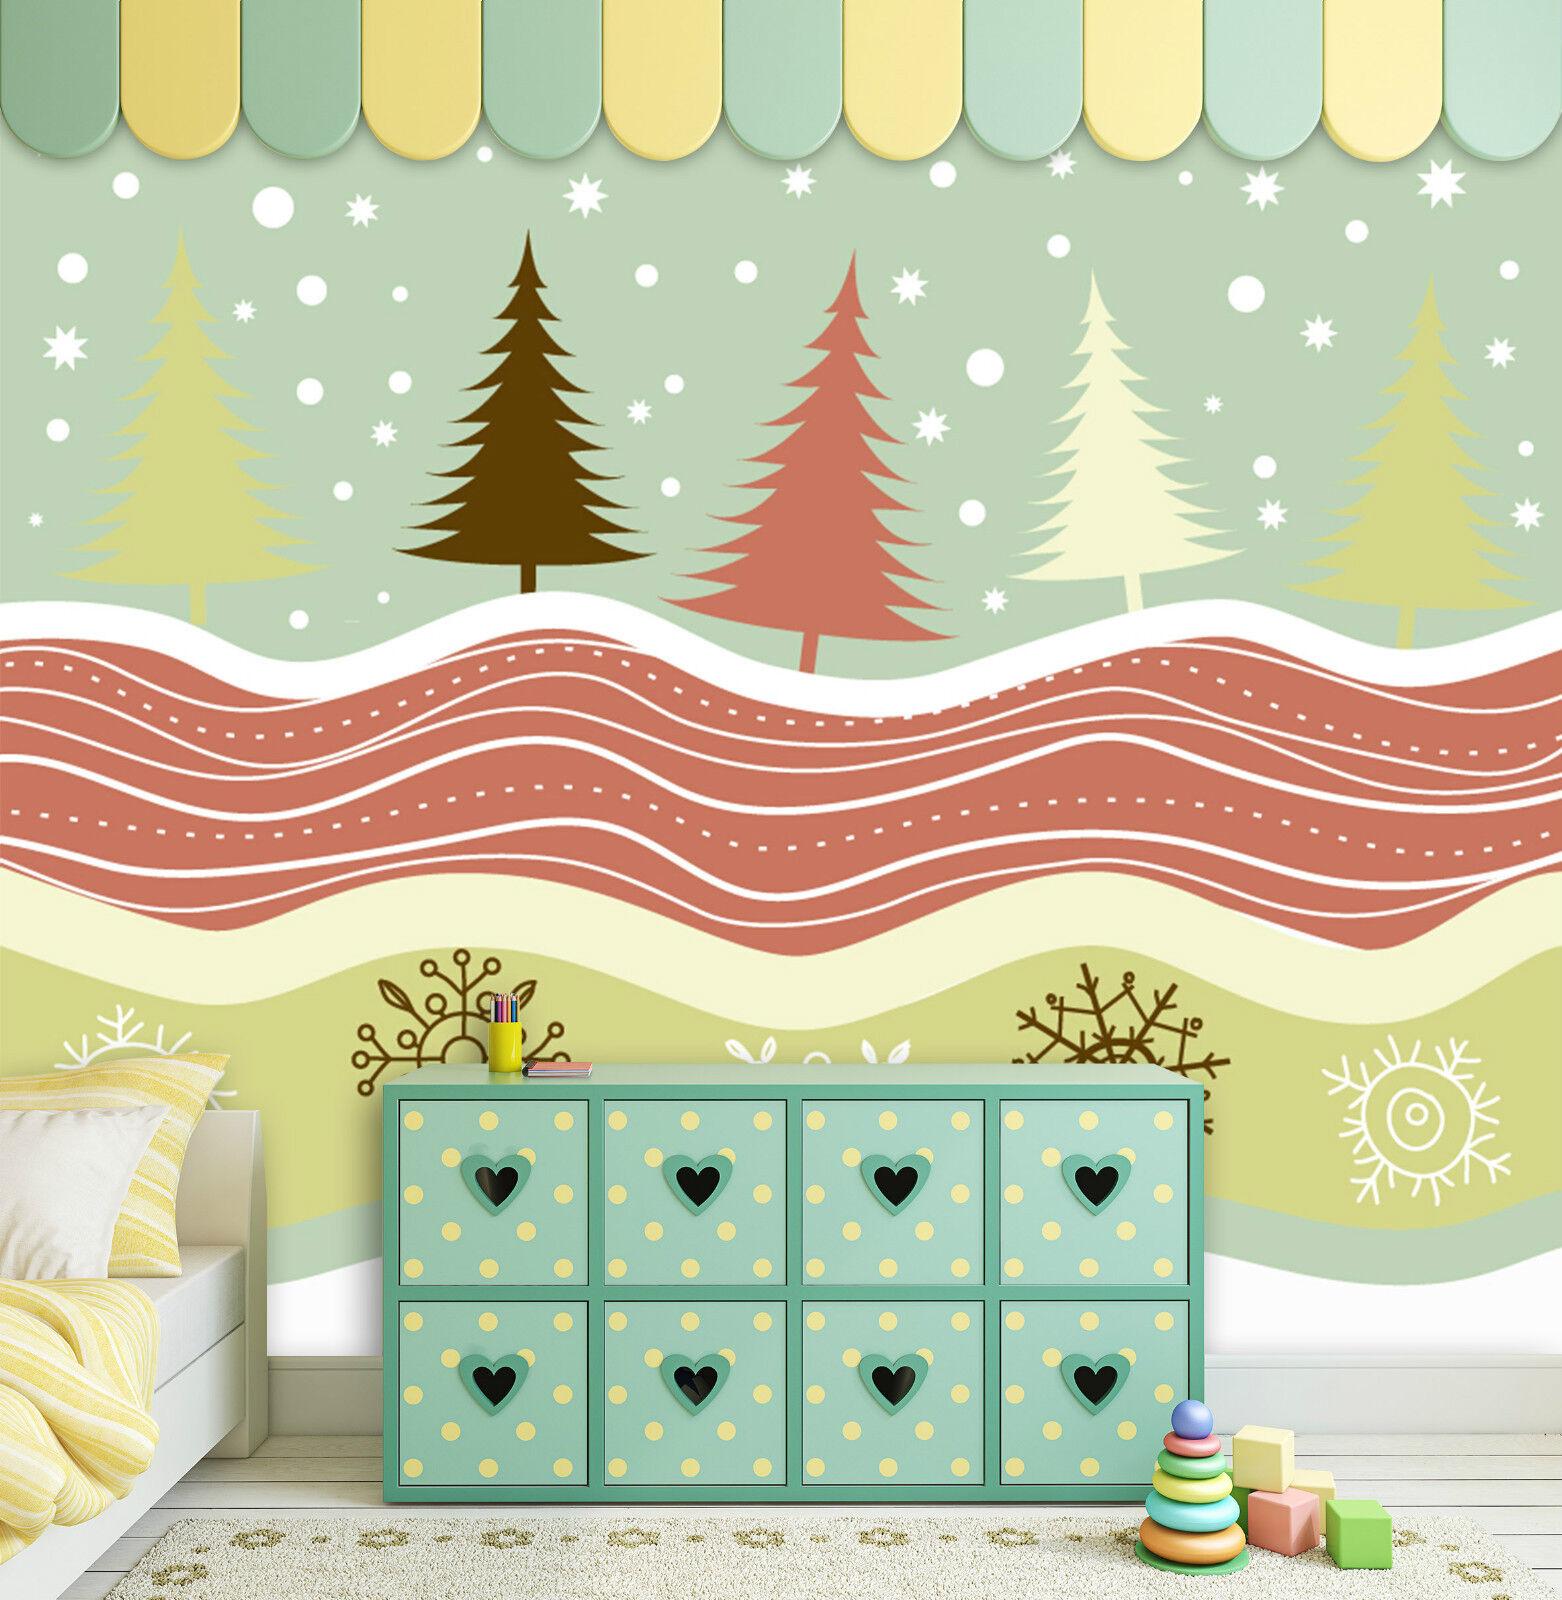 3D Christmas Farbeful ripples WallPaper Murals Print Decal Wall AJ WALLPAPER